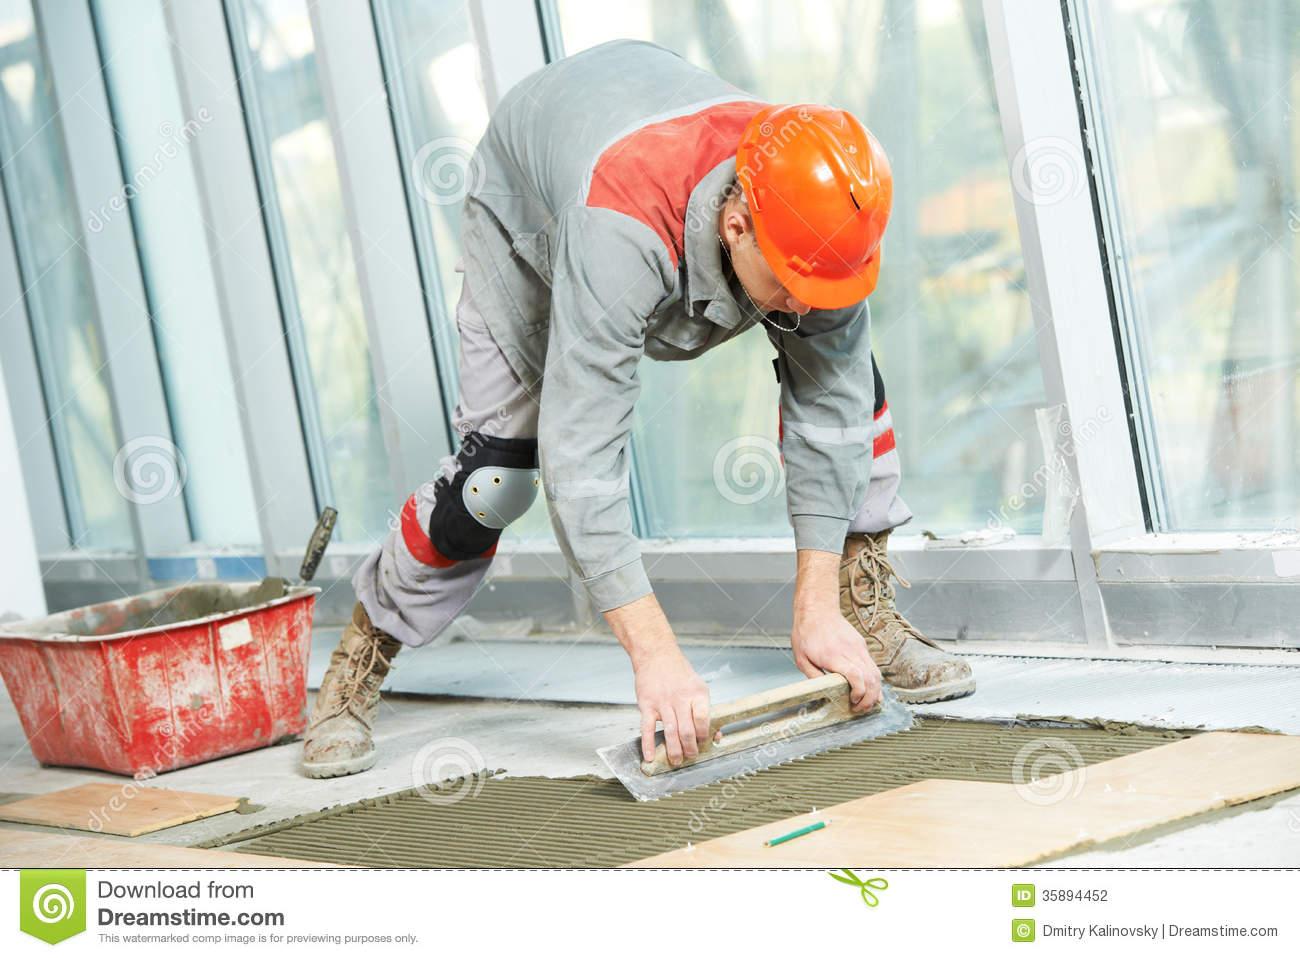 Clipart Work On Floor Clipground